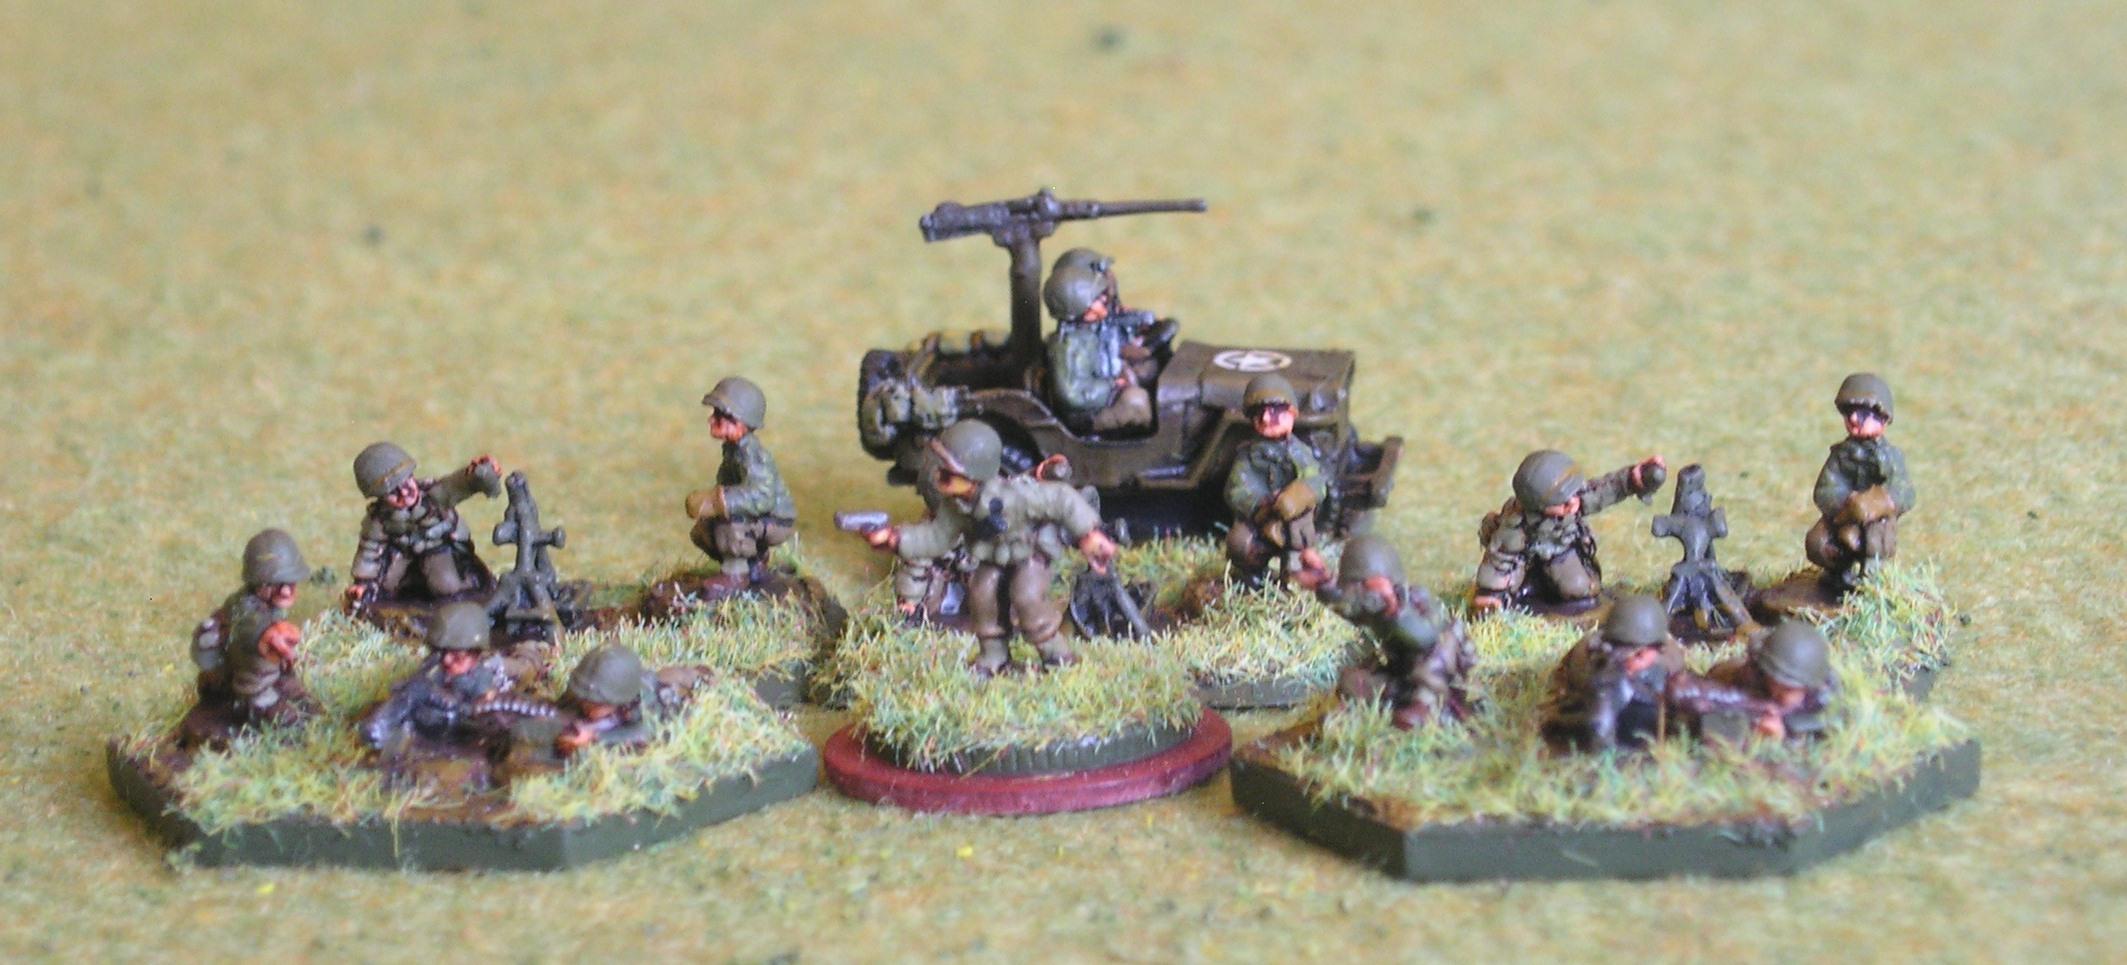 Weapons Platoon(3 x Light Mortar; 2 x MMG)